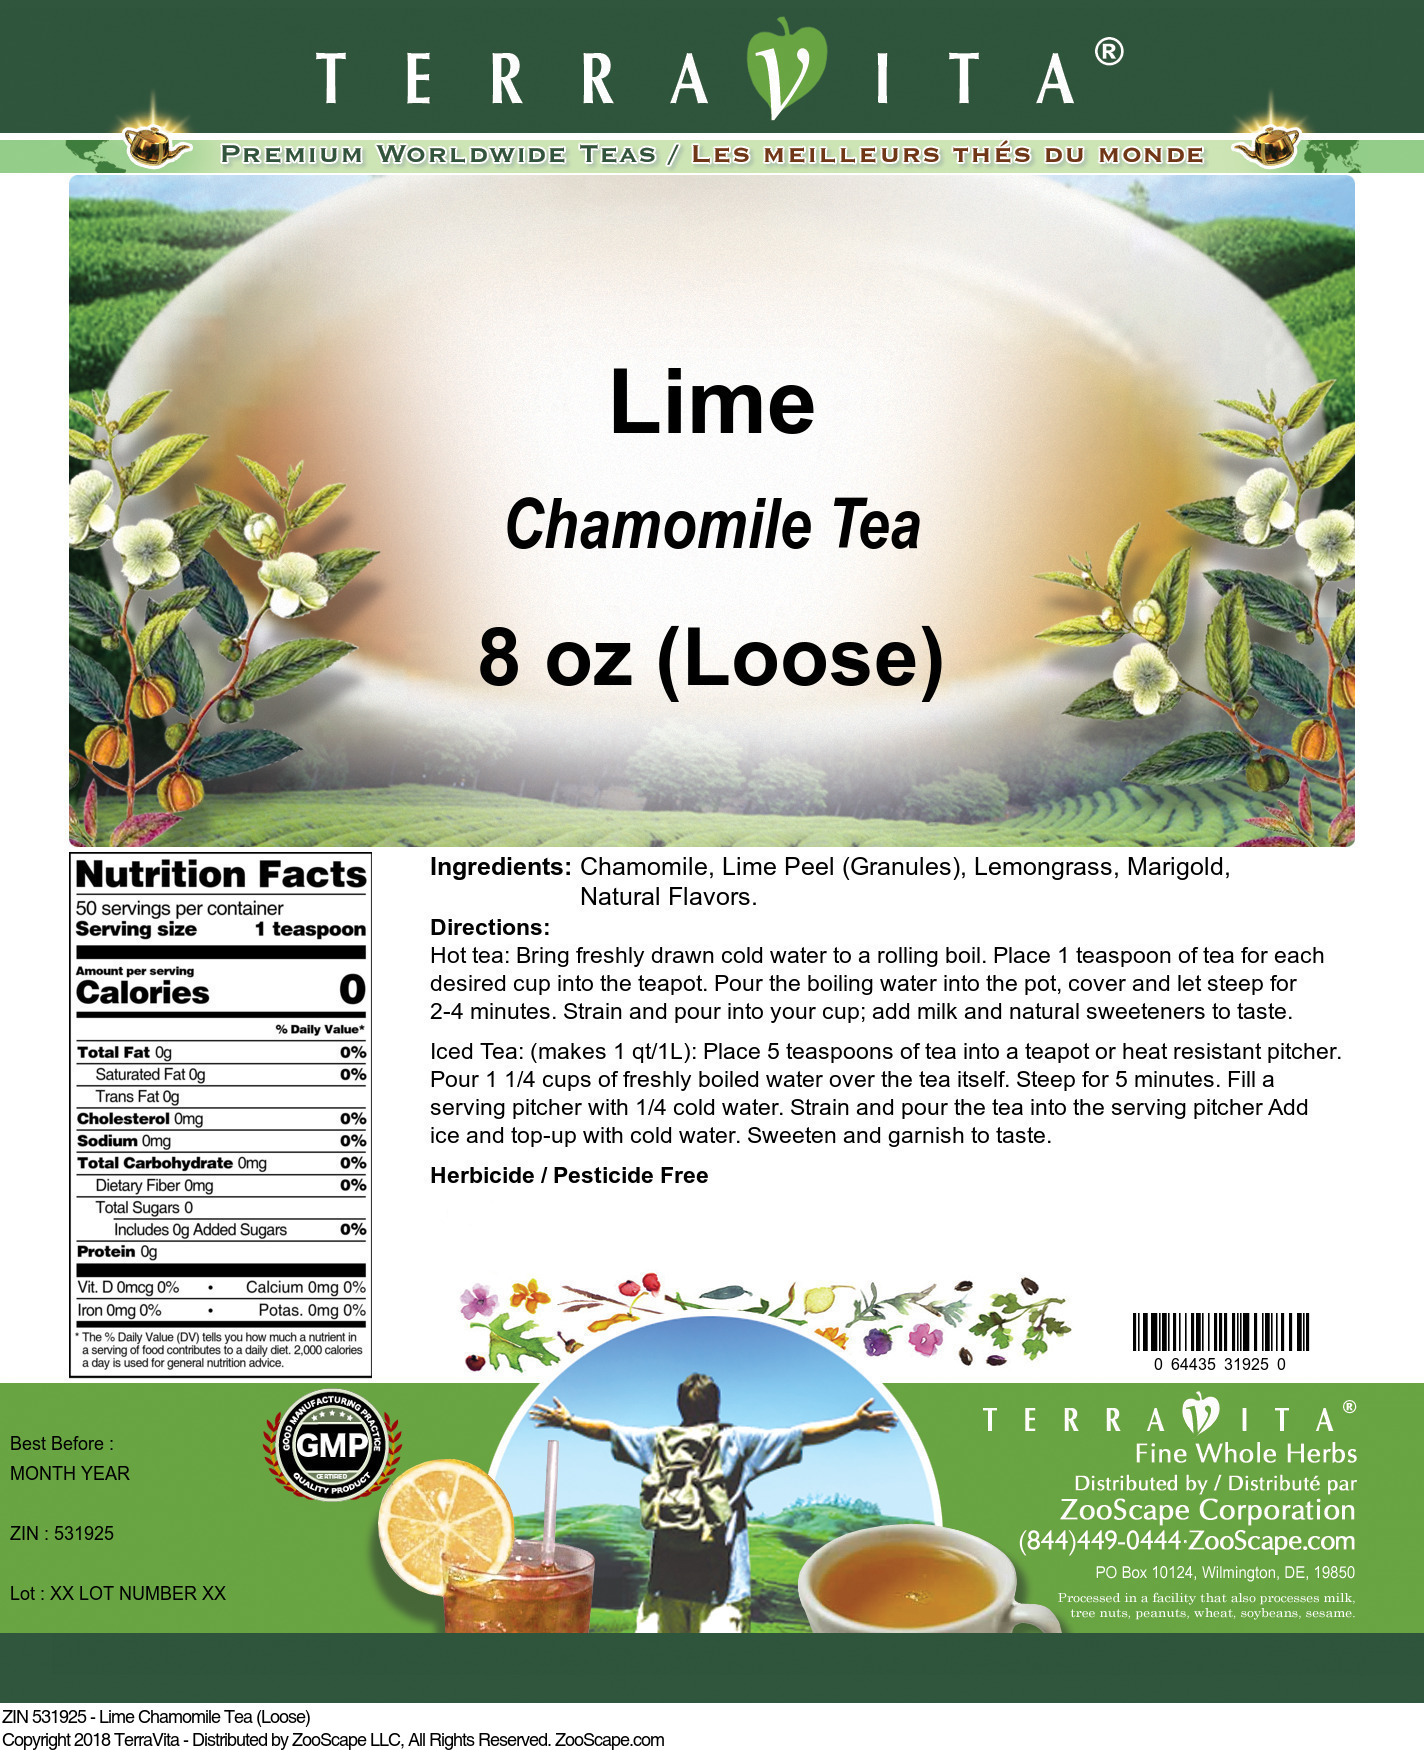 Lime Chamomile Tea